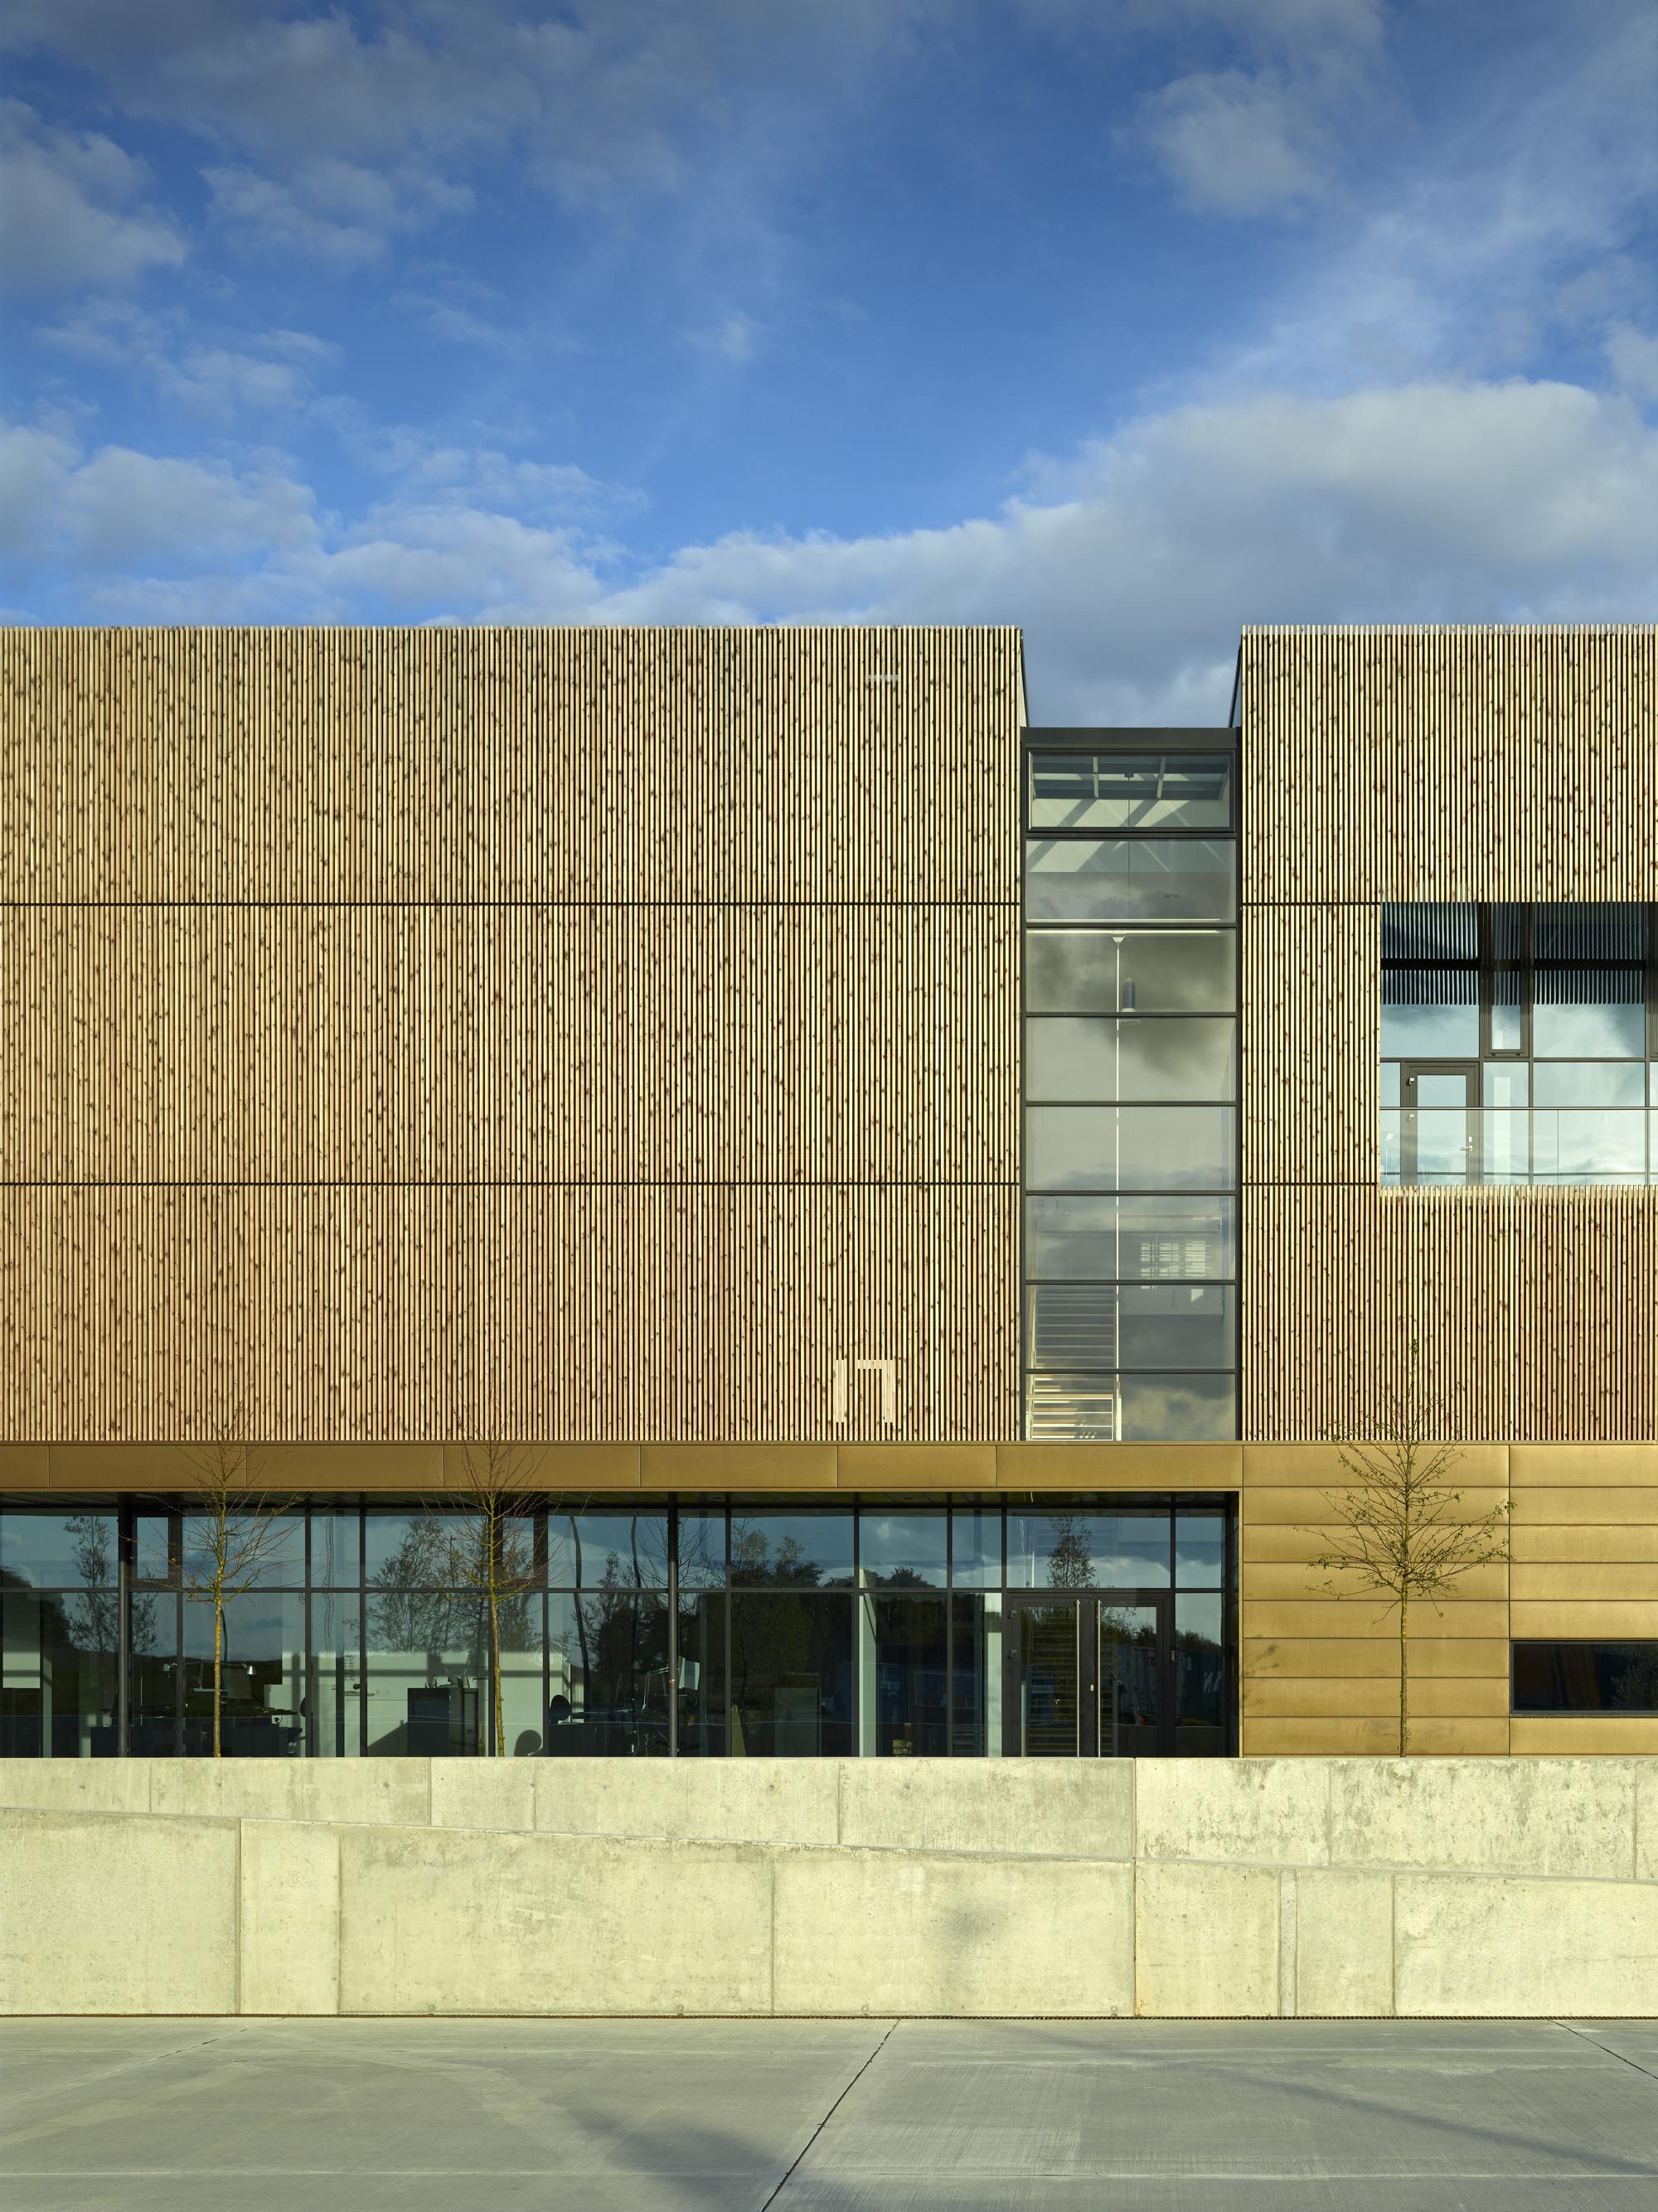 Bestseller Logistics Centre North / C.F. Møller Architects